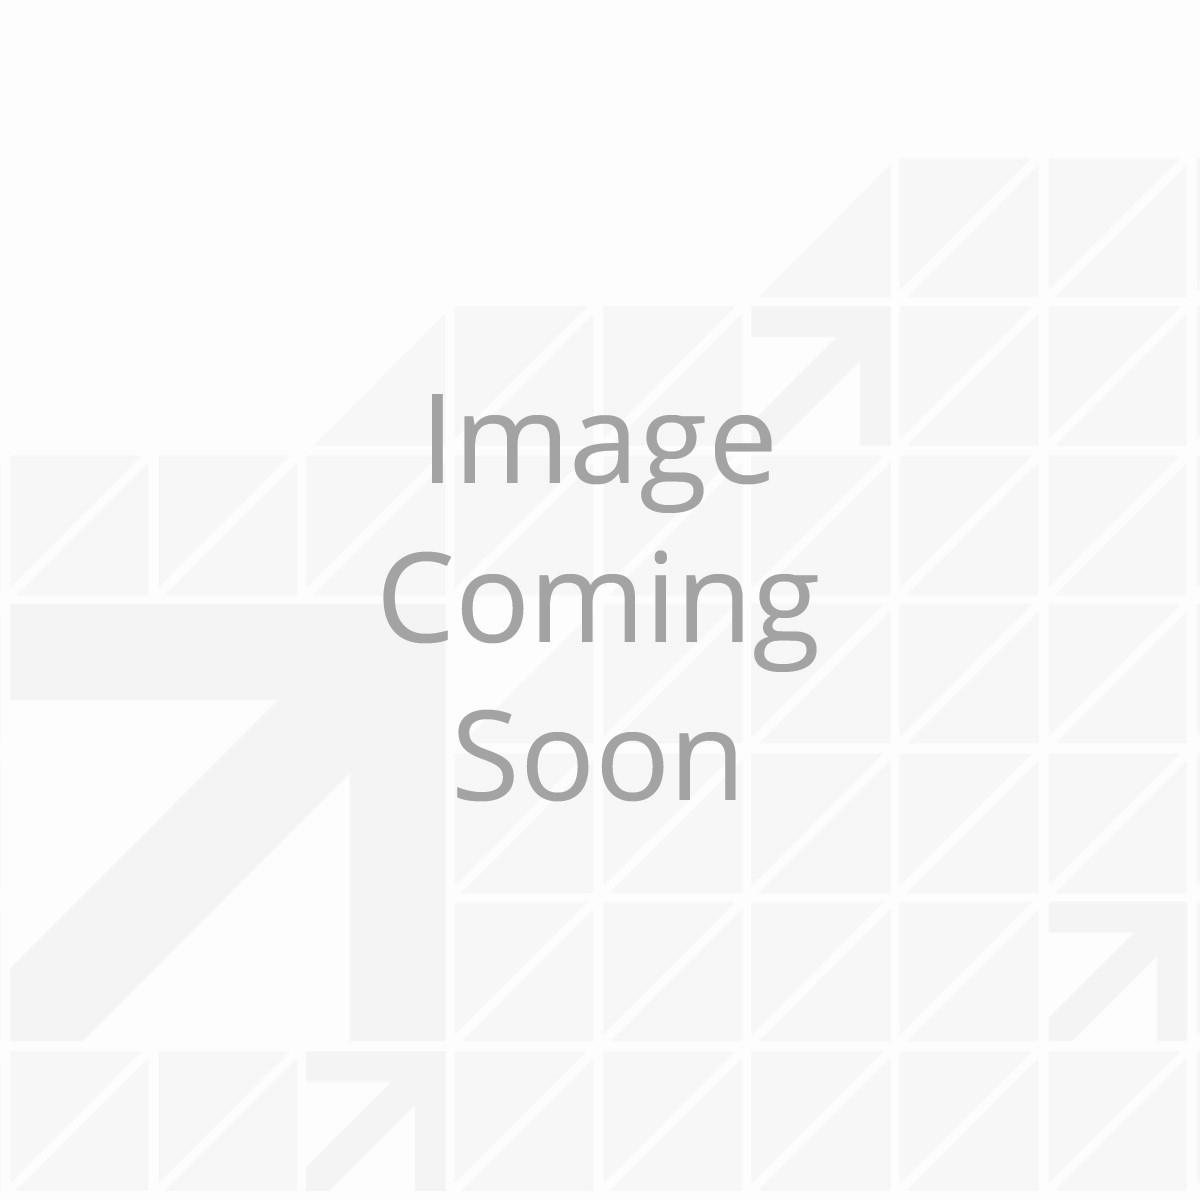 117919_-_hex_bolt_-_001